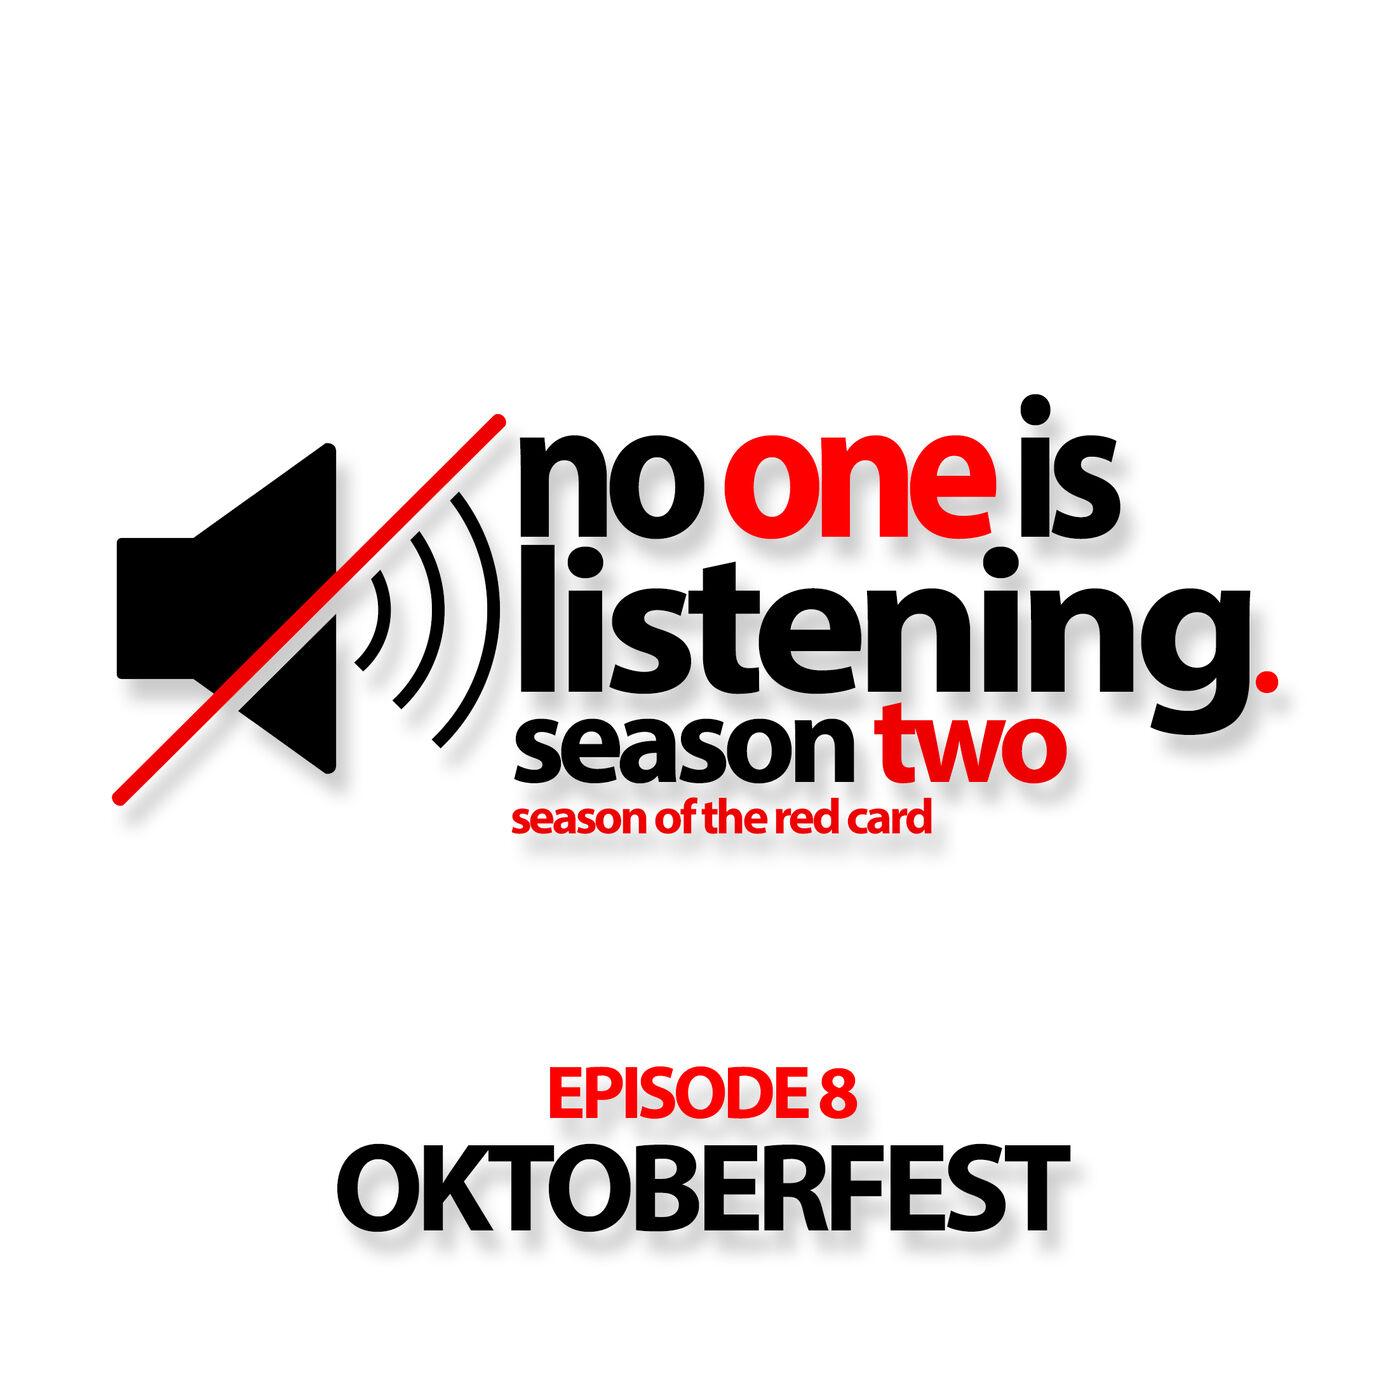 S2E8 Oktoberfest